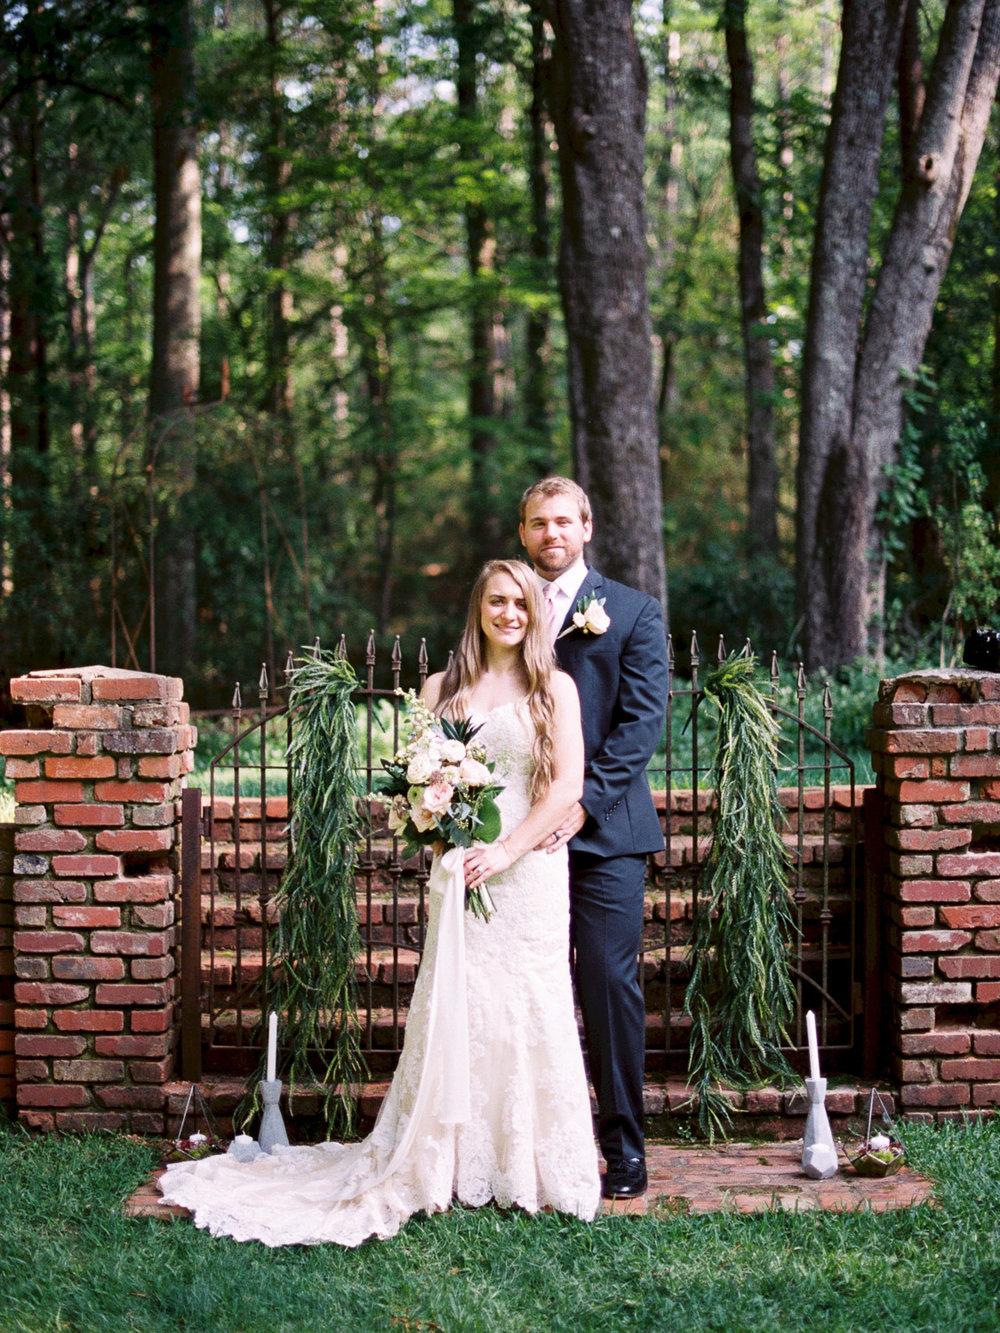 christinadavisphotography-romanticwedding-gardenweddinginspiration39.jpg